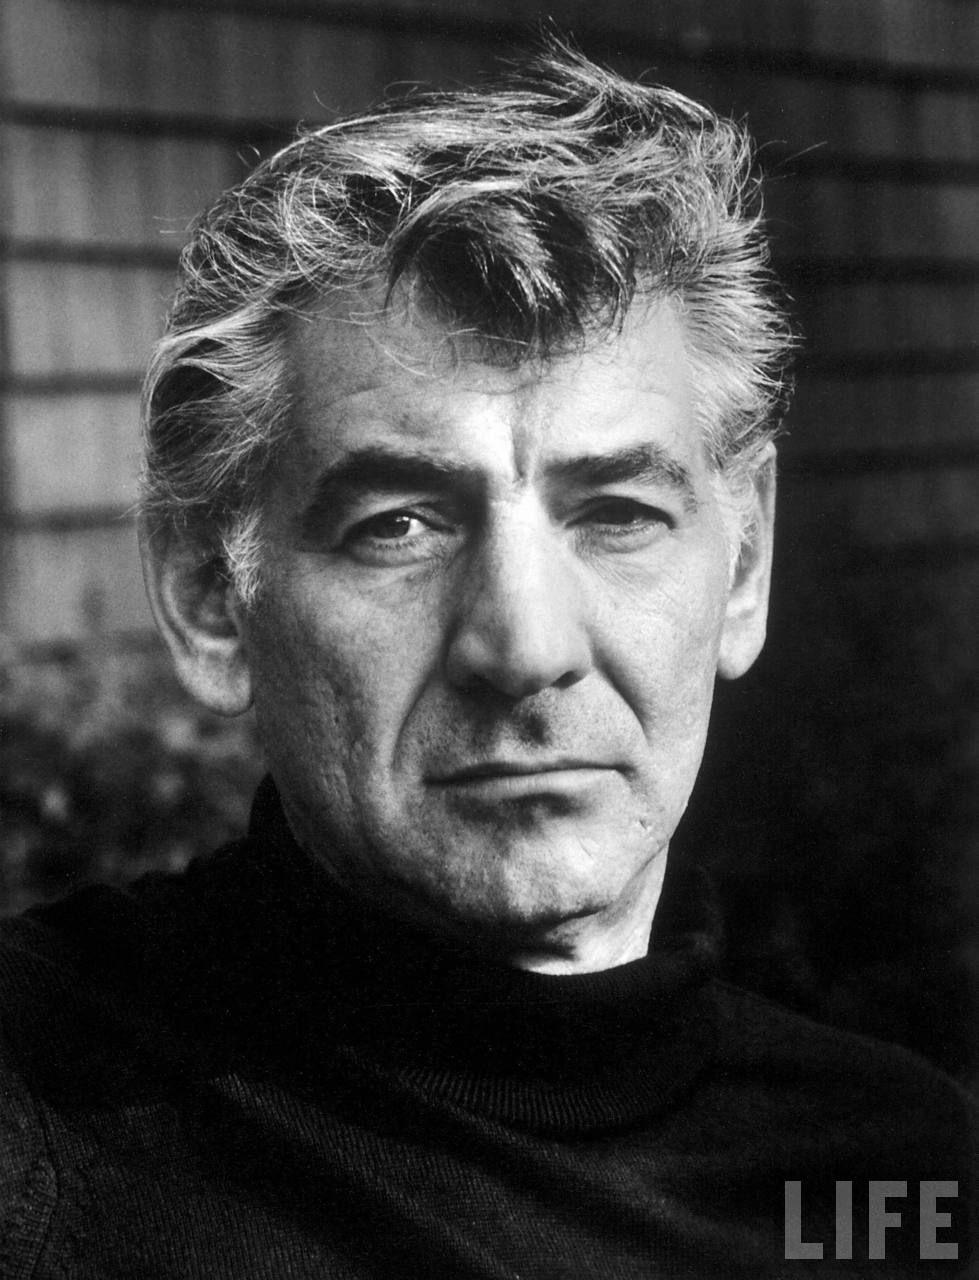 Leonard Bernstein ne Louis Bernstein, Lawrence MA, (1918-1990), composer and conductor, heart attack.  Ukrainian Jewish heritage.